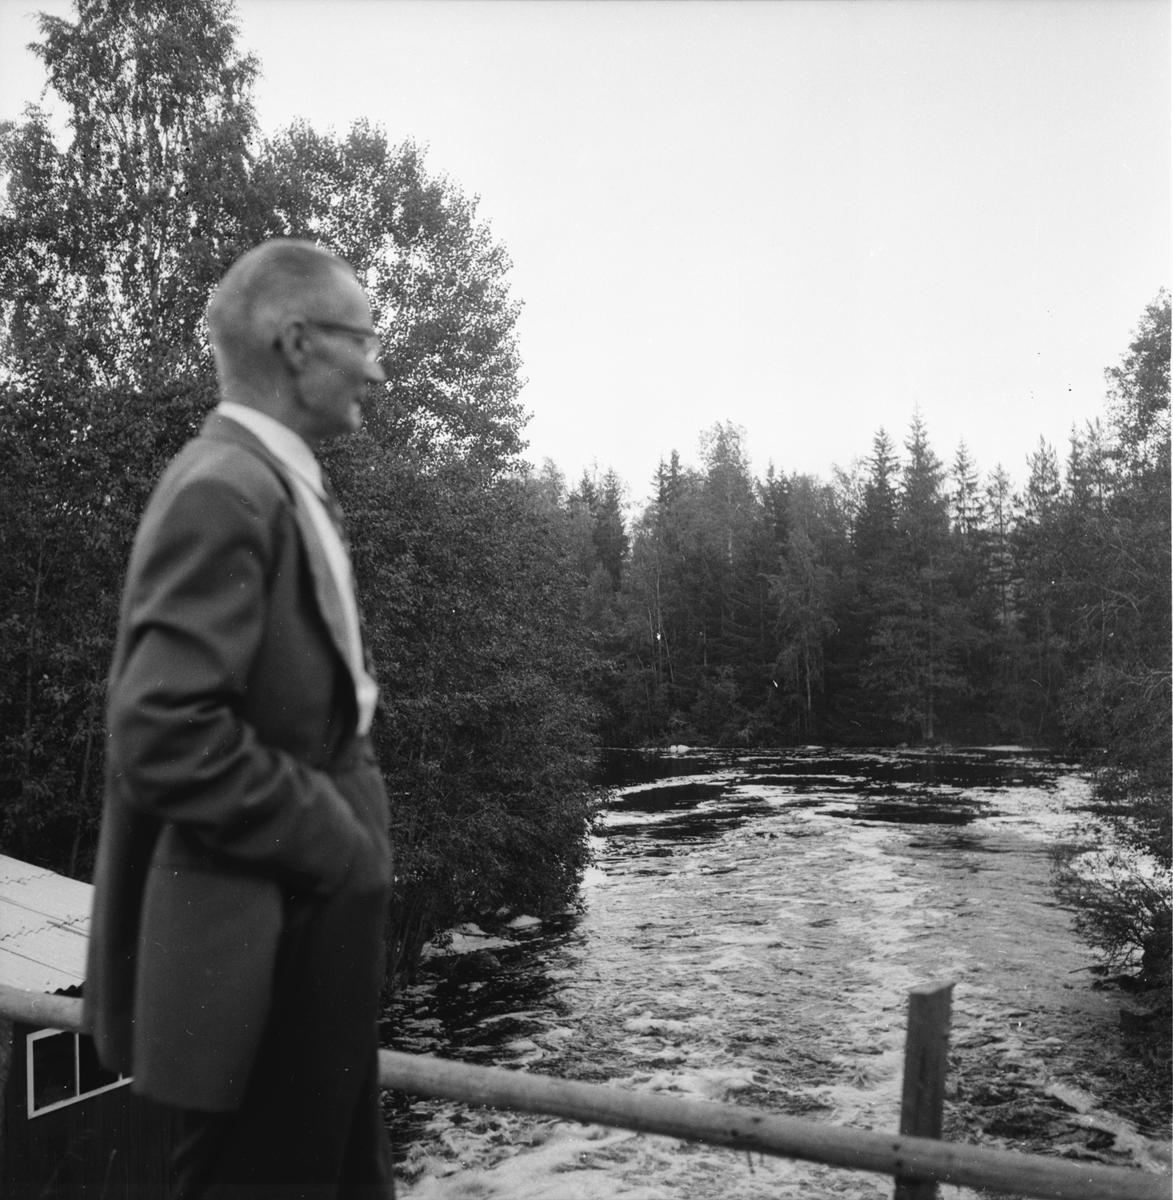 Siste liesmeden Johan Tjäder vid Olofsfors. Augusti 1958